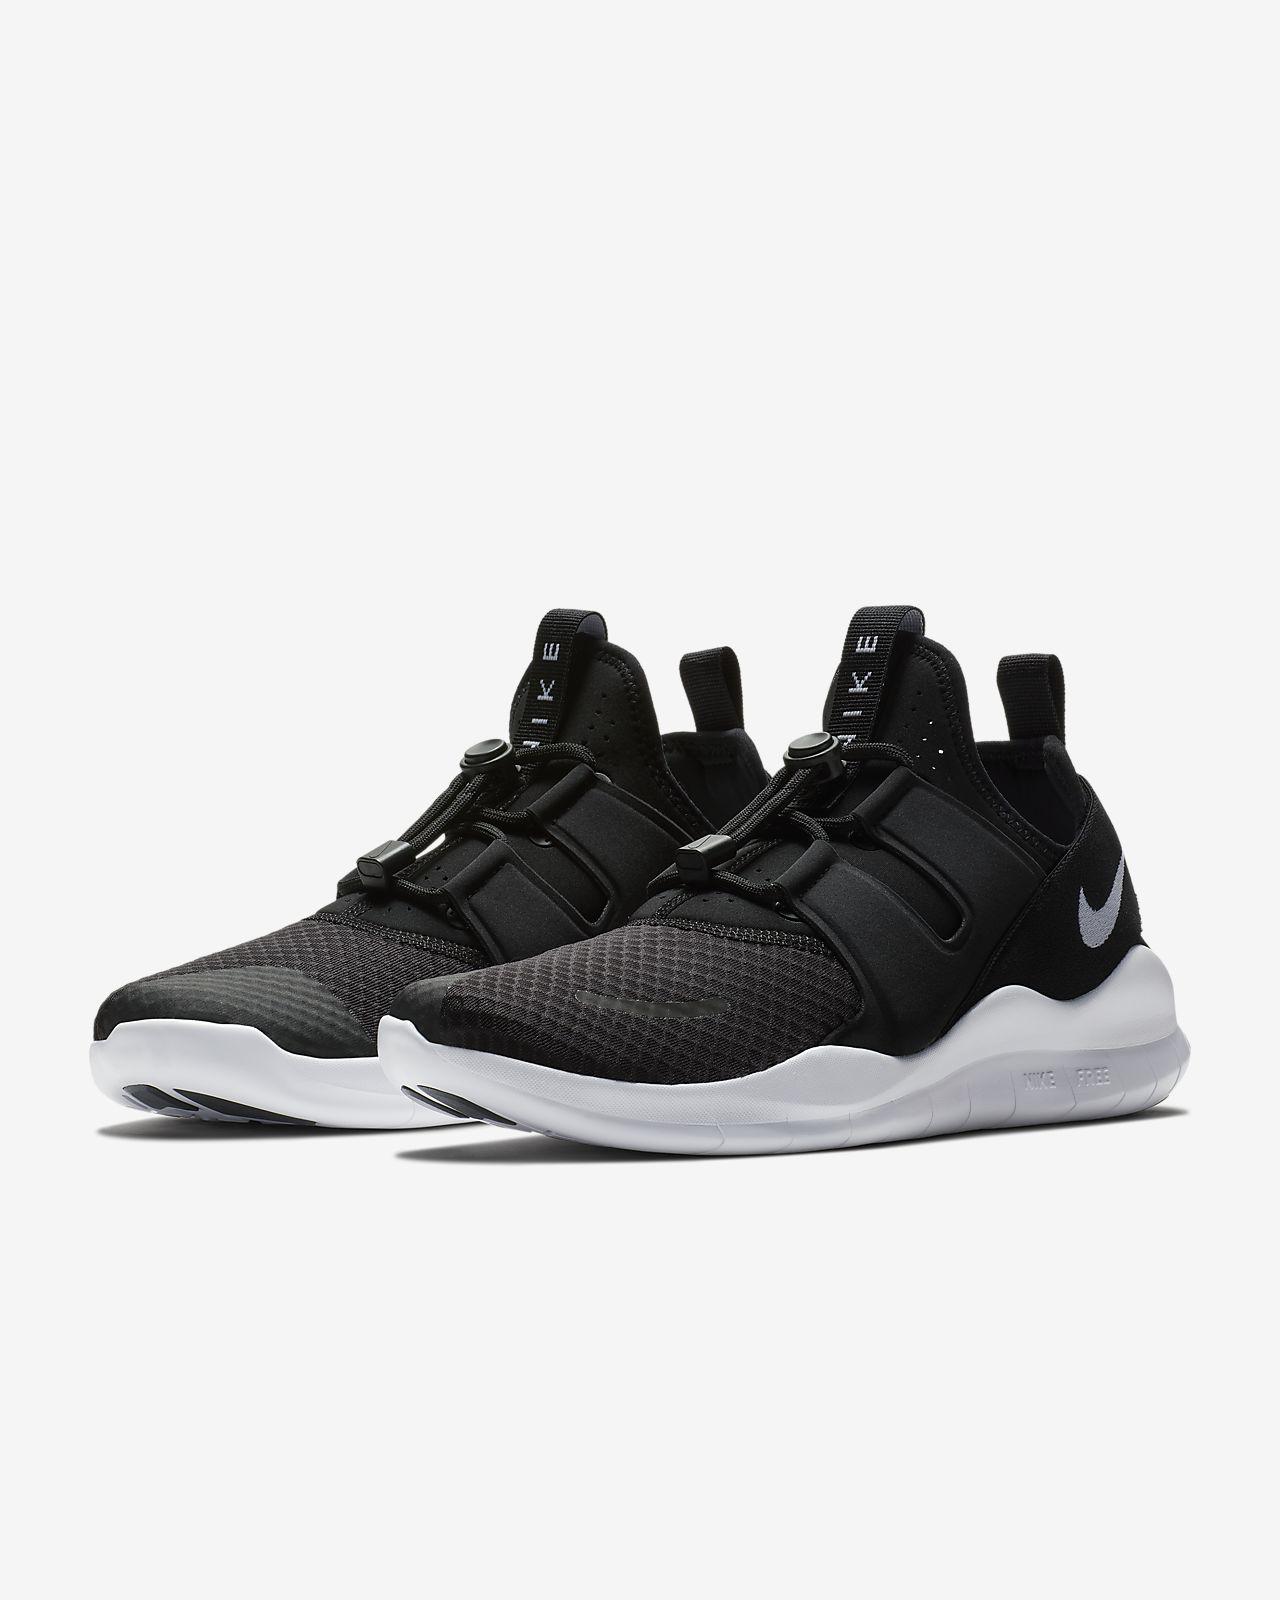 5fd3f4fdda3b1 Nike Free RN Commuter 2018 Men s Running Shoe. Nike.com